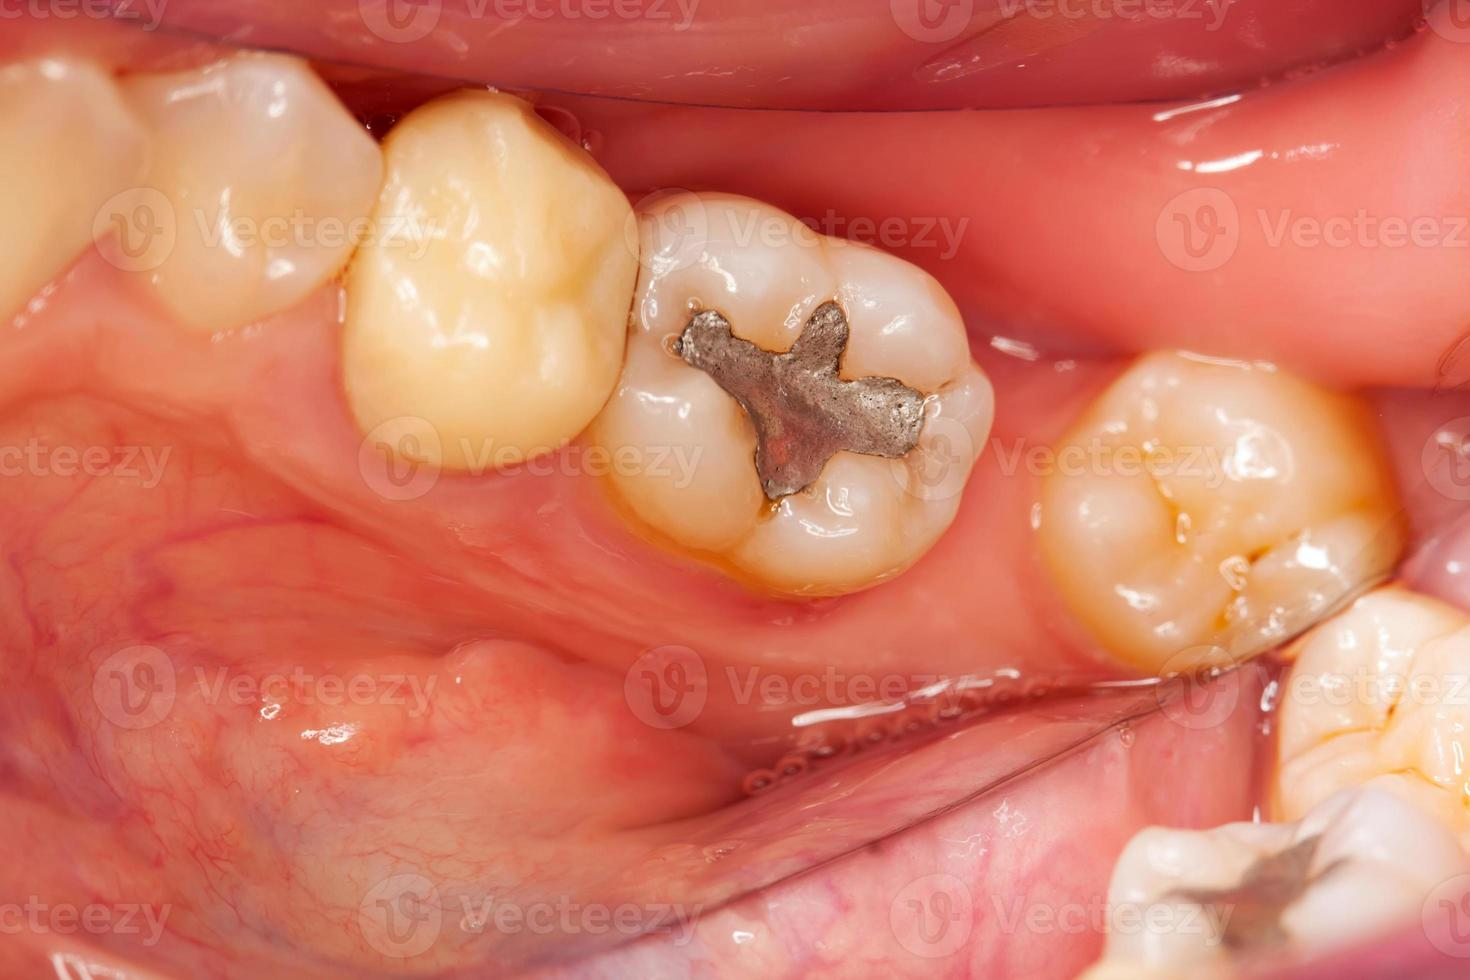 Zahnprobleme foto